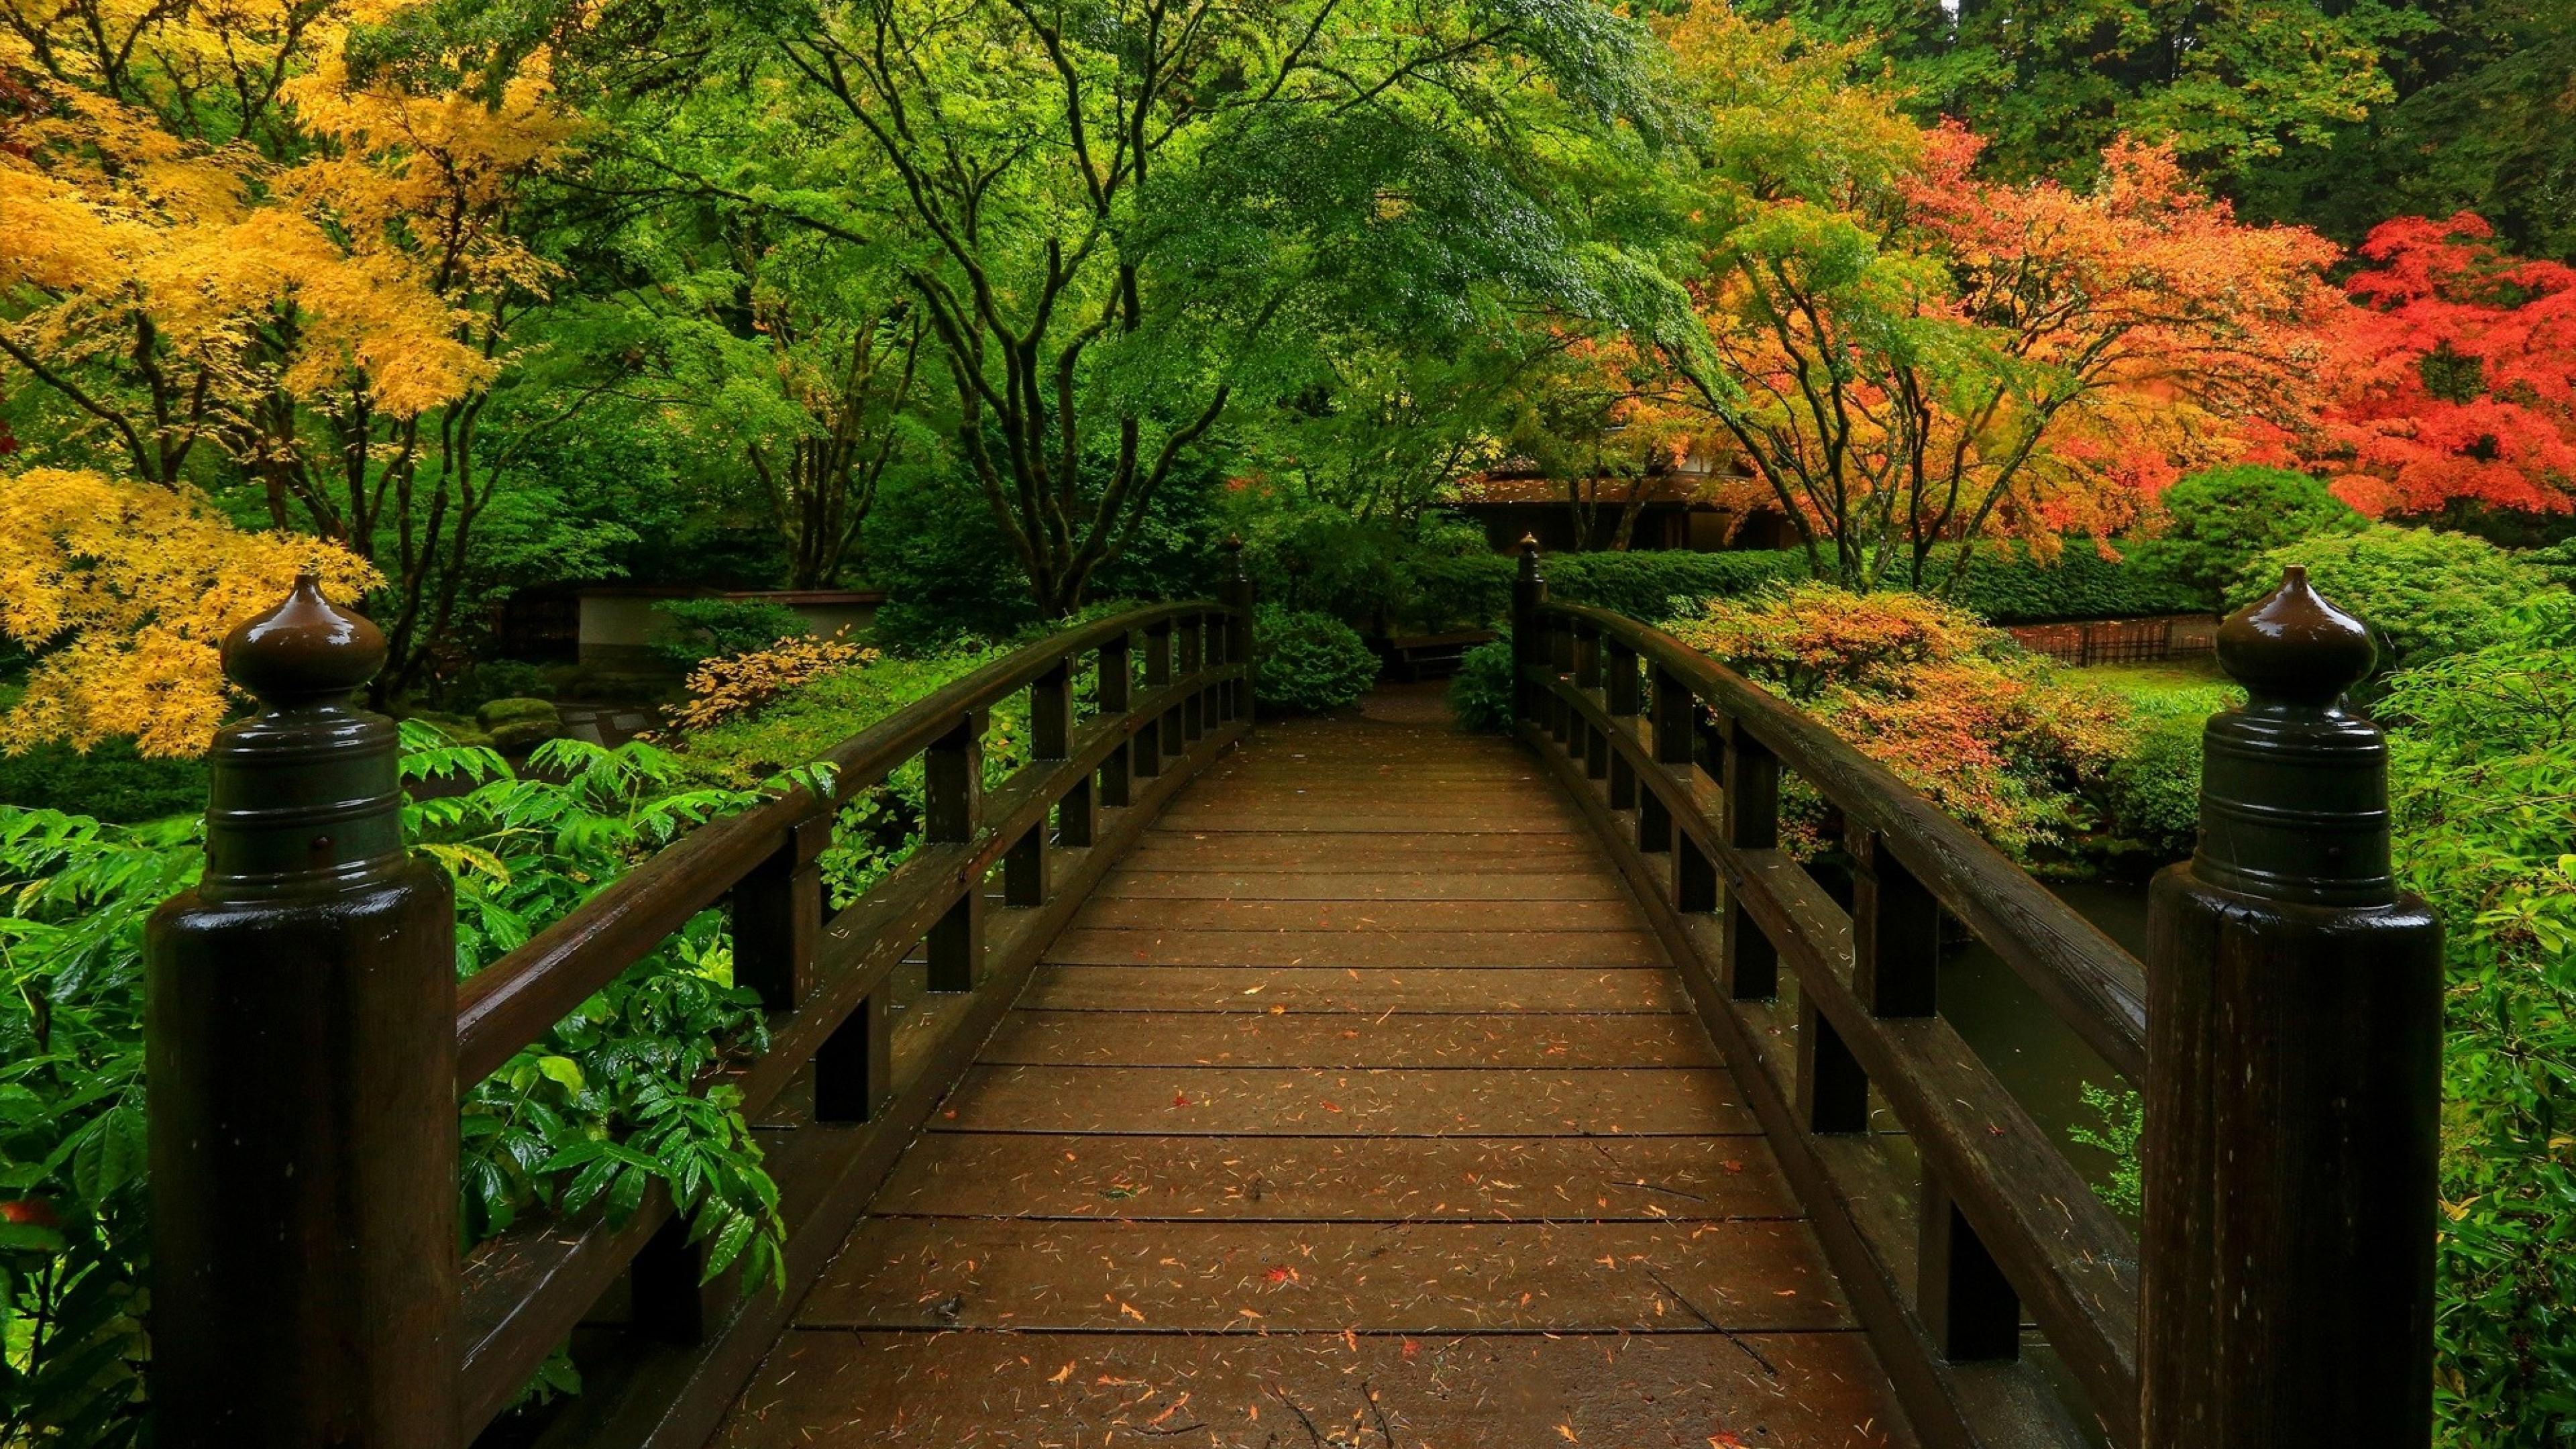 Zen Nature Hd Phone Wallpapers Top Free Zen Nature Hd Phone Backgrounds Wallpaperaccess